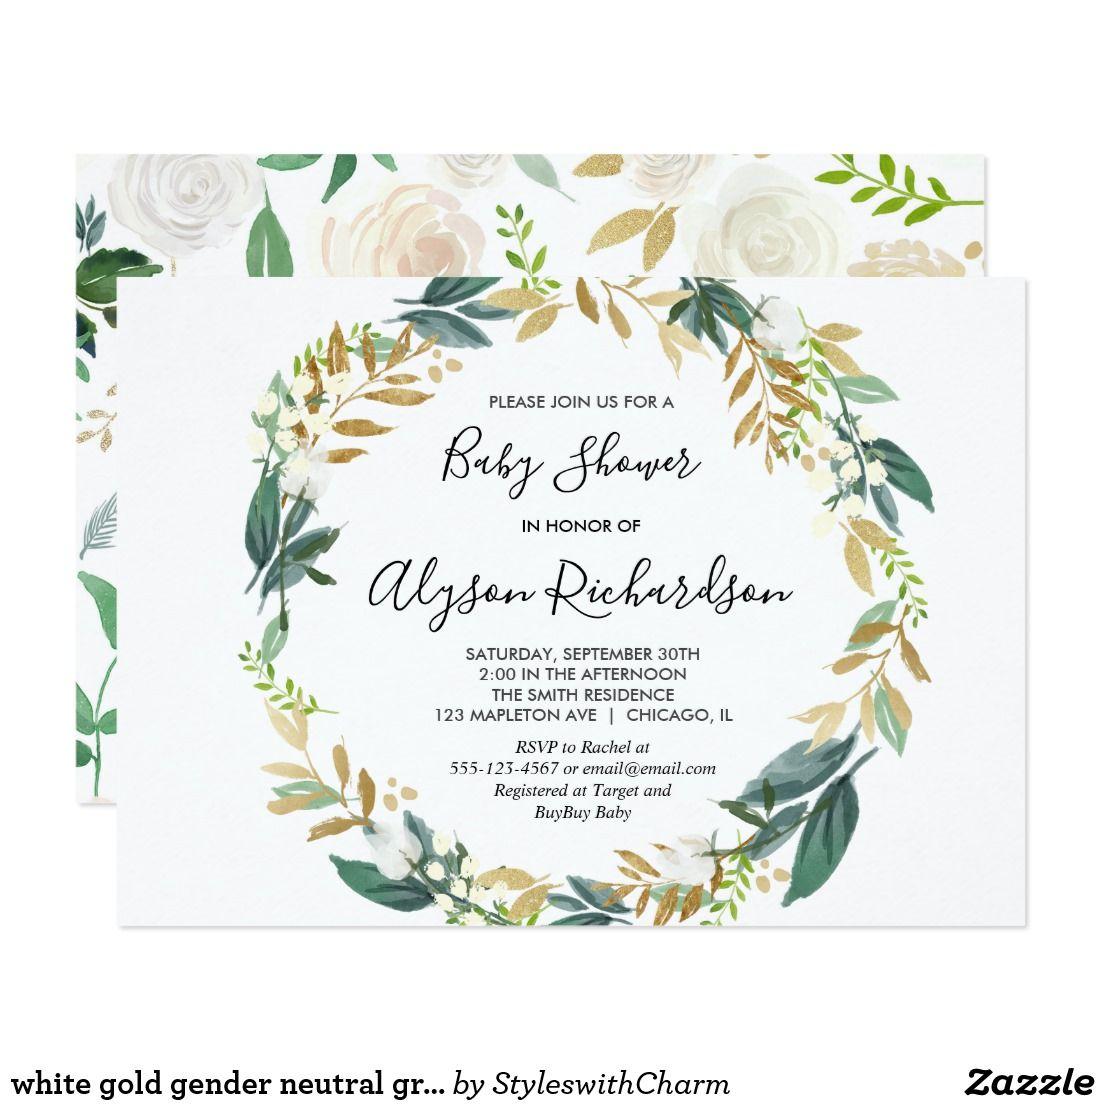 white gold gender neutral greenery baby shower invitation